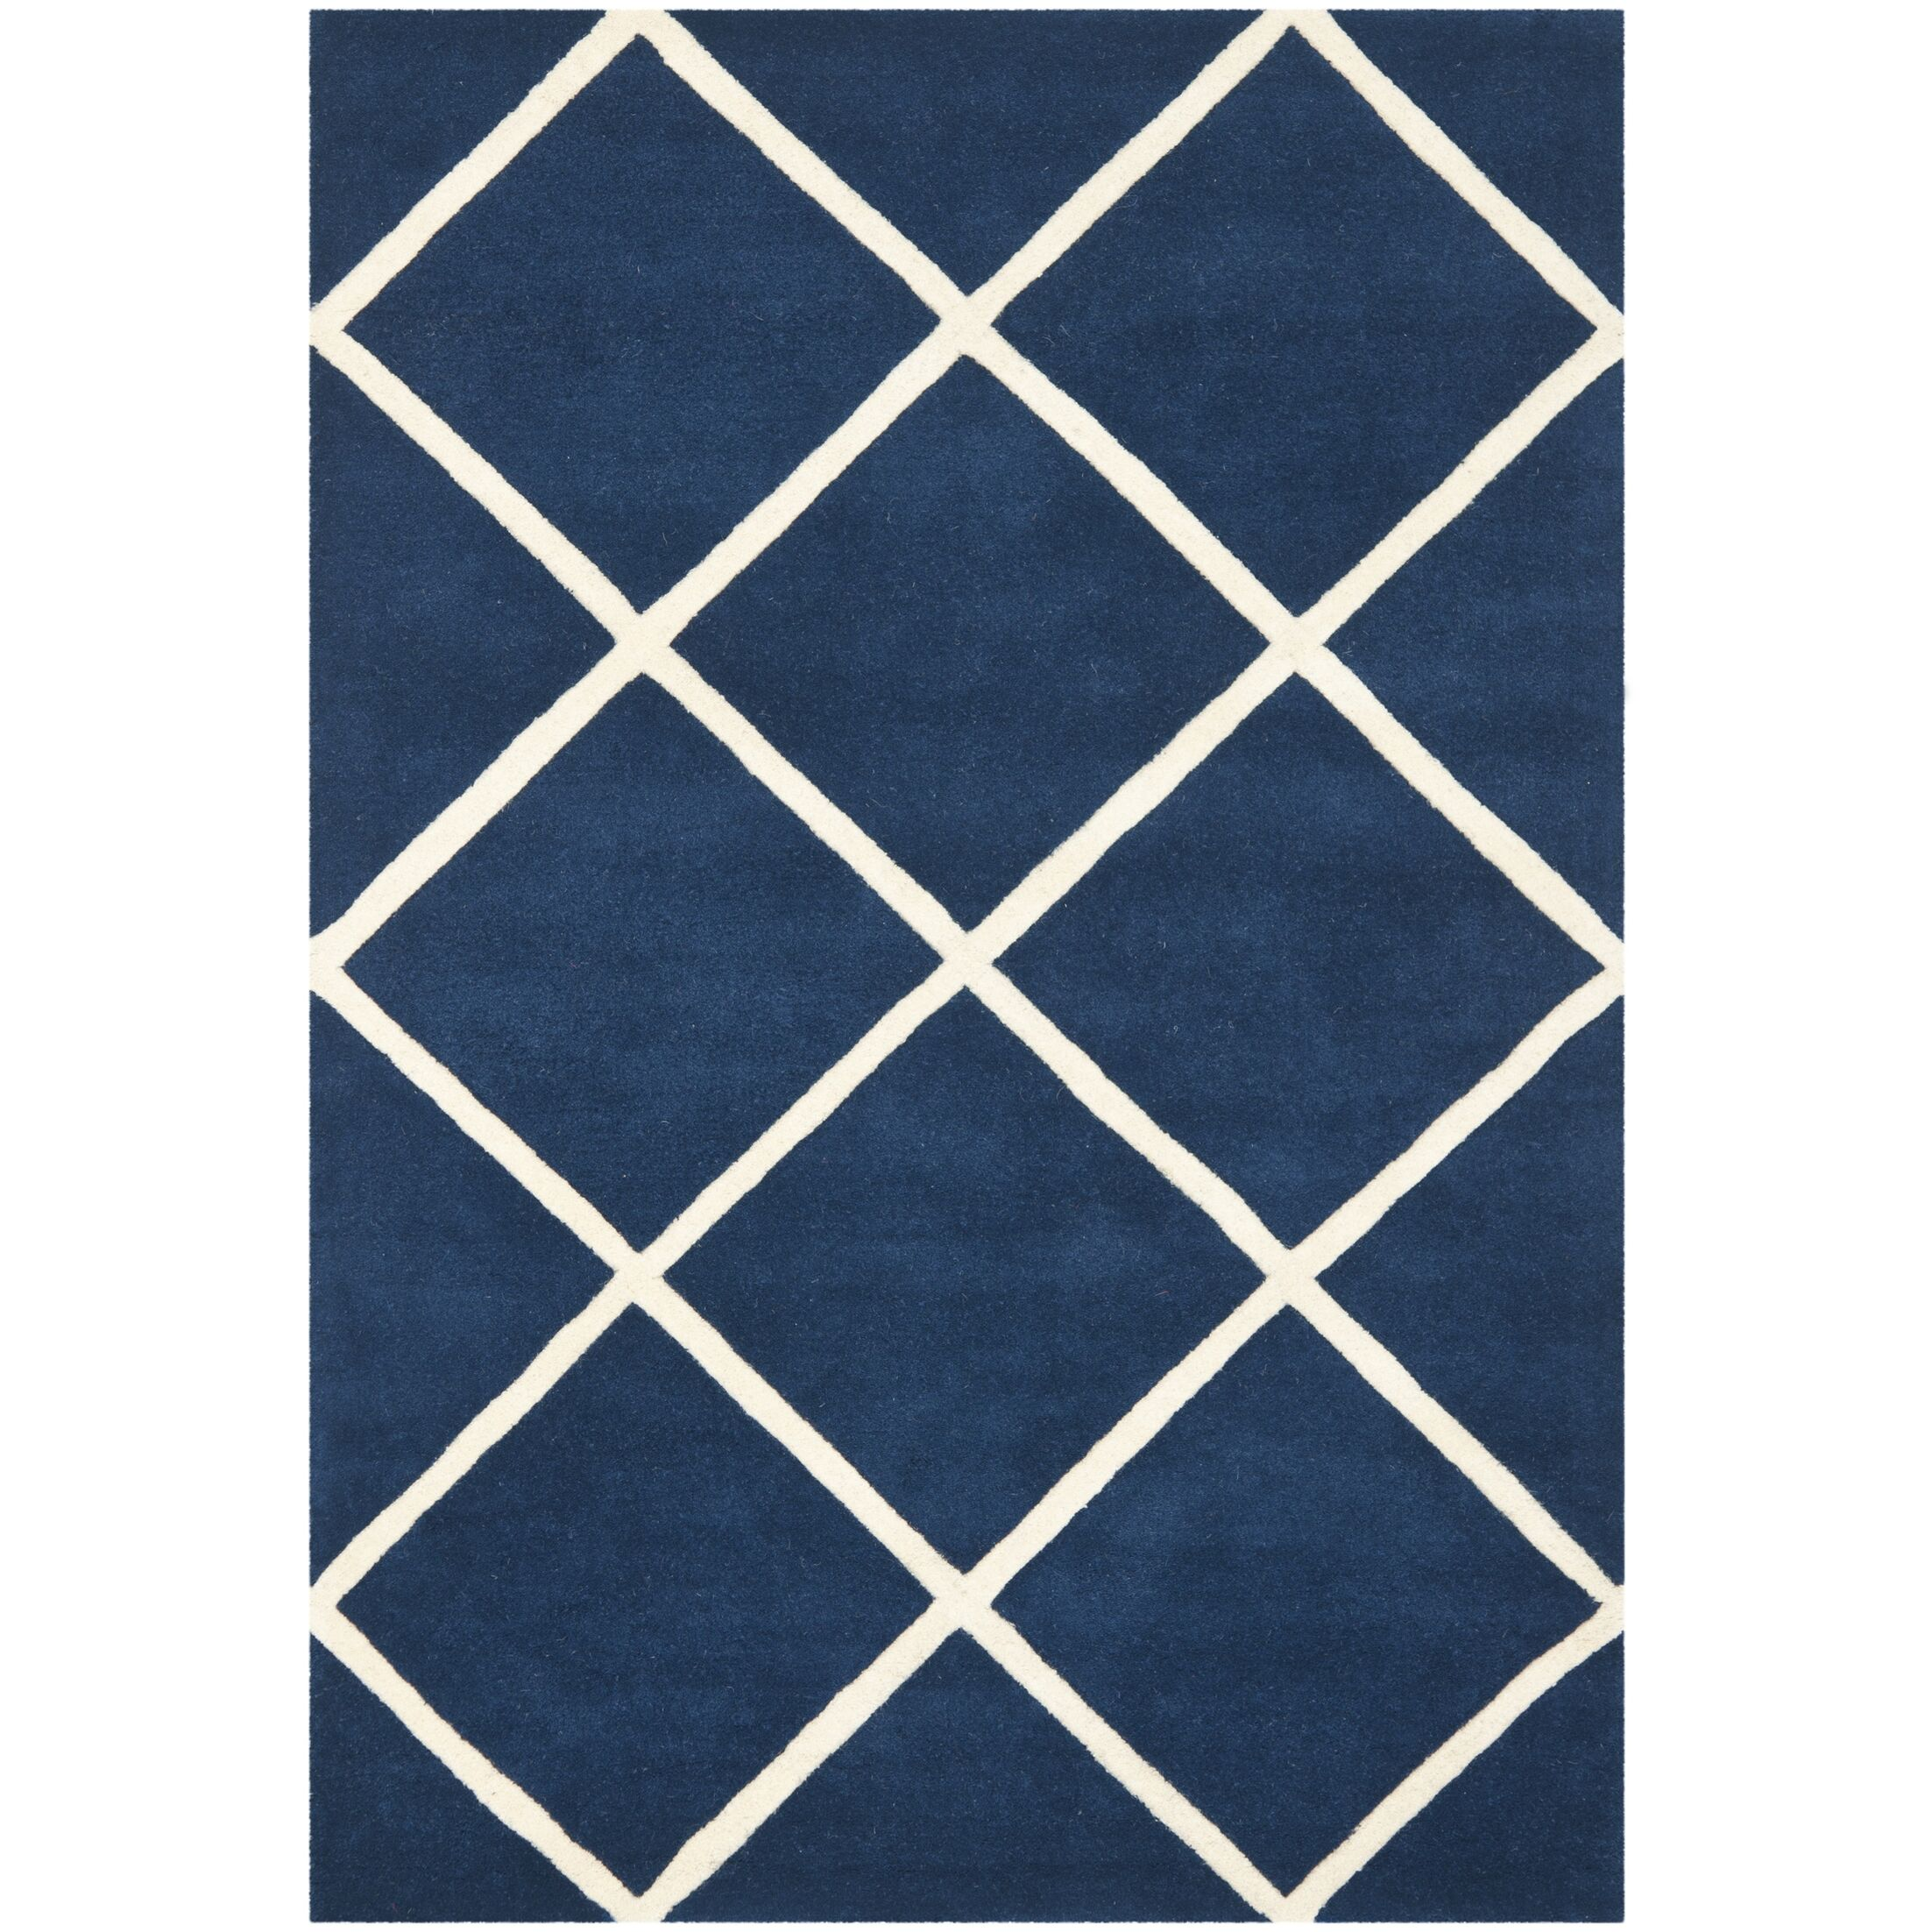 Wilkin Dark Blue & Ivory Area Rug Rug Size: Rectangle 8'9